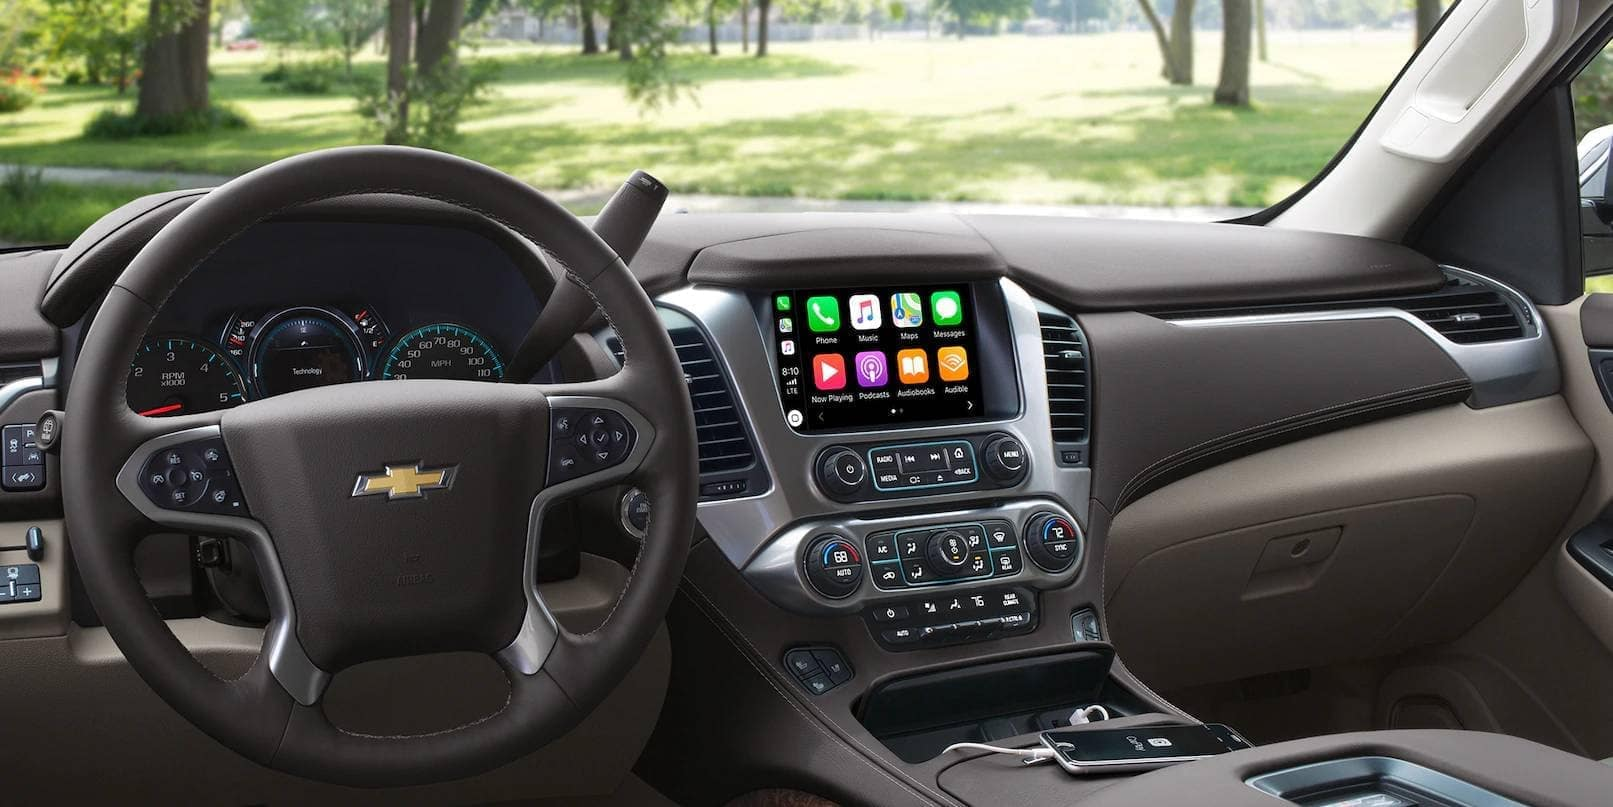 2019 Chevrolet Tahoe front interior